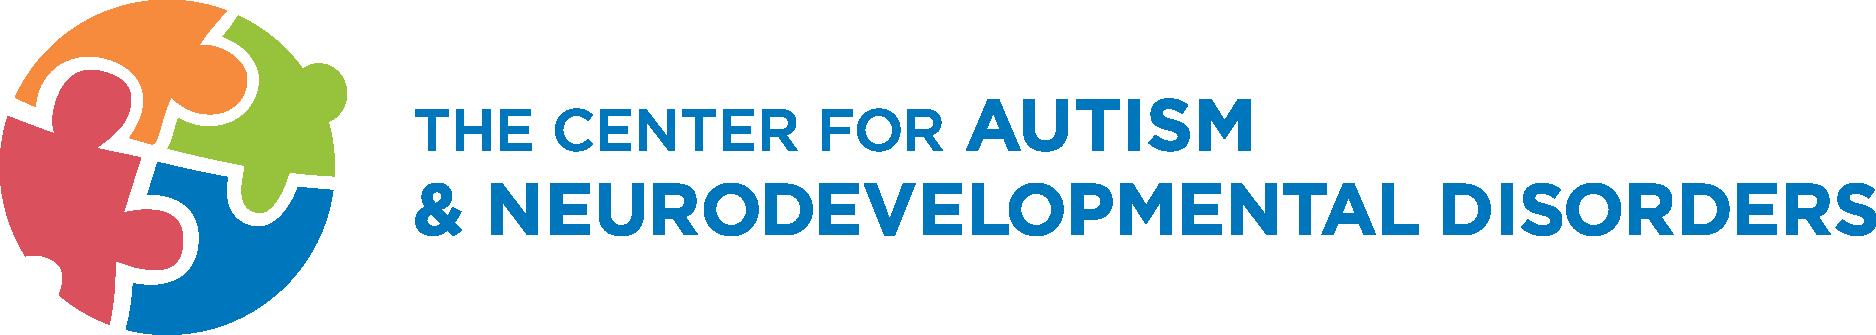 The Center for Autism & Neurodevelopmental Disorders